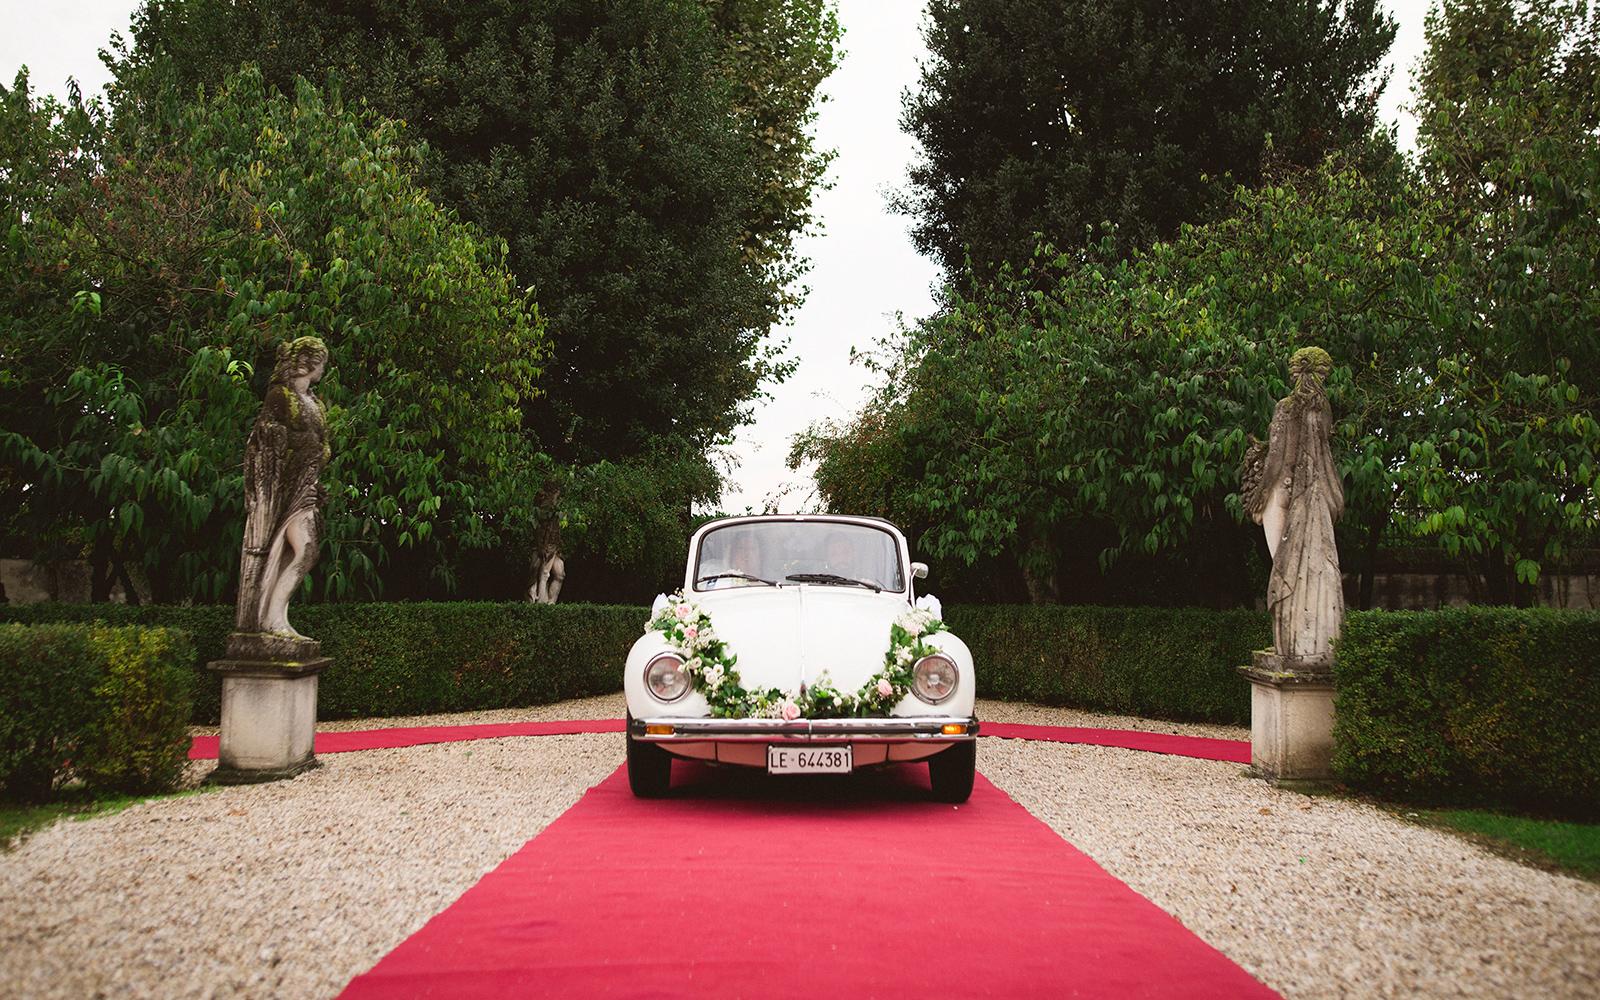 location matrimoni Vicenza, location matrimonio Padova, Location matrimonio Vicenza , location matrimoni Padova, ricevimento matrimonio Vicenza,giardino esterno matrimoni Vicenza, giardino esterno matrimoni Padova